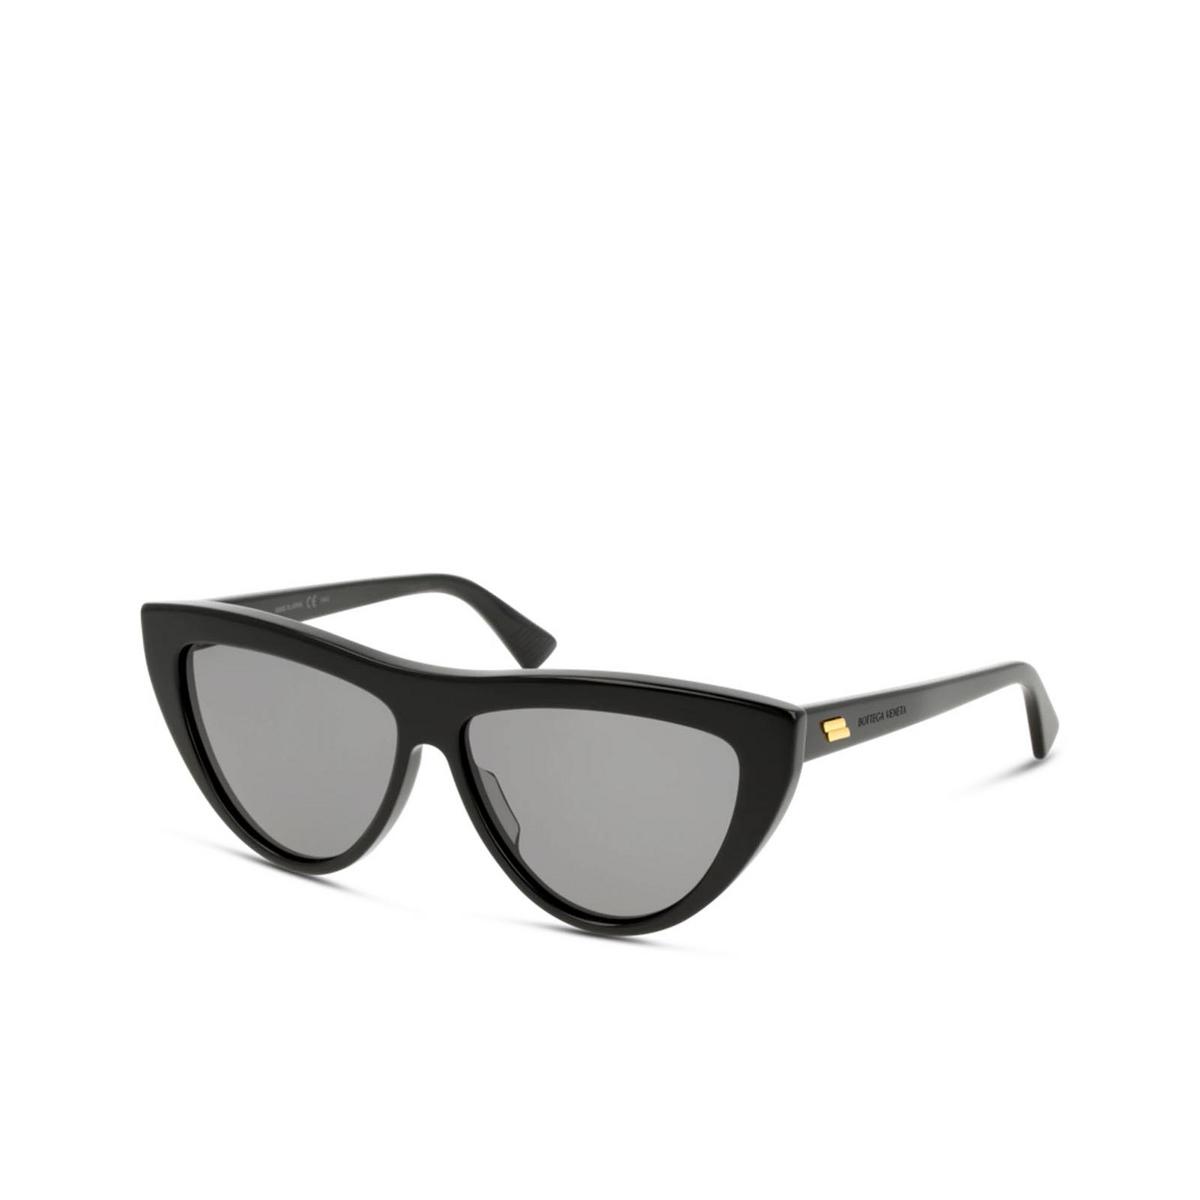 Bottega Veneta® Cat-eye Sunglasses: BV1018S color Black 001 - three-quarters view.